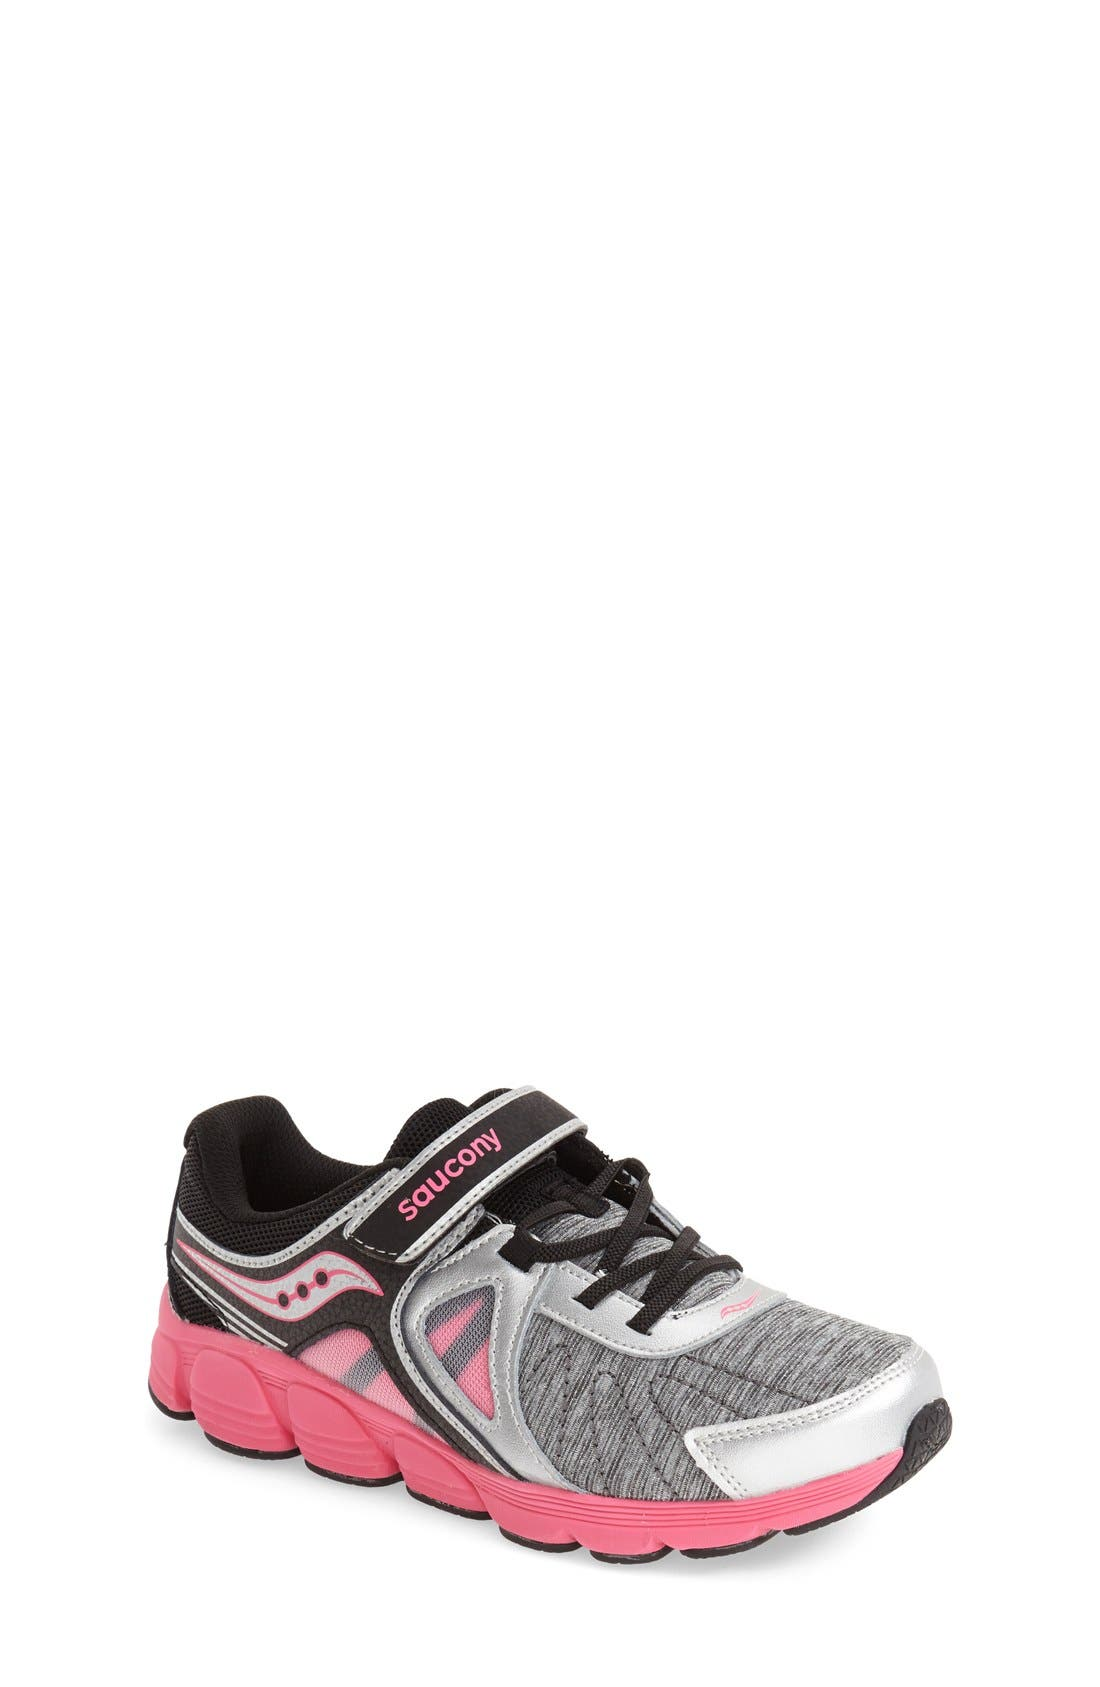 'Kotaro 3 AC' Athletic Sneaker,                             Main thumbnail 1, color,